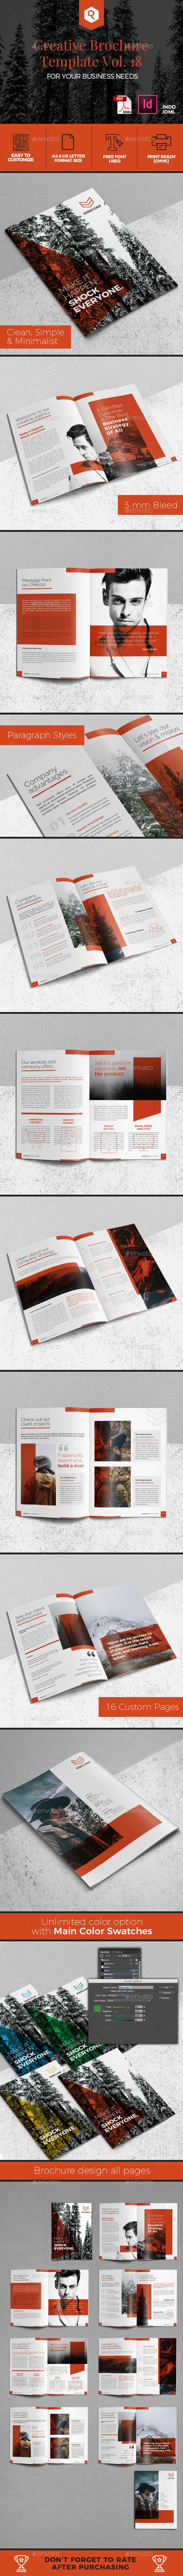 Creative Brochure Template Vol. 18 - Corporate Brochures